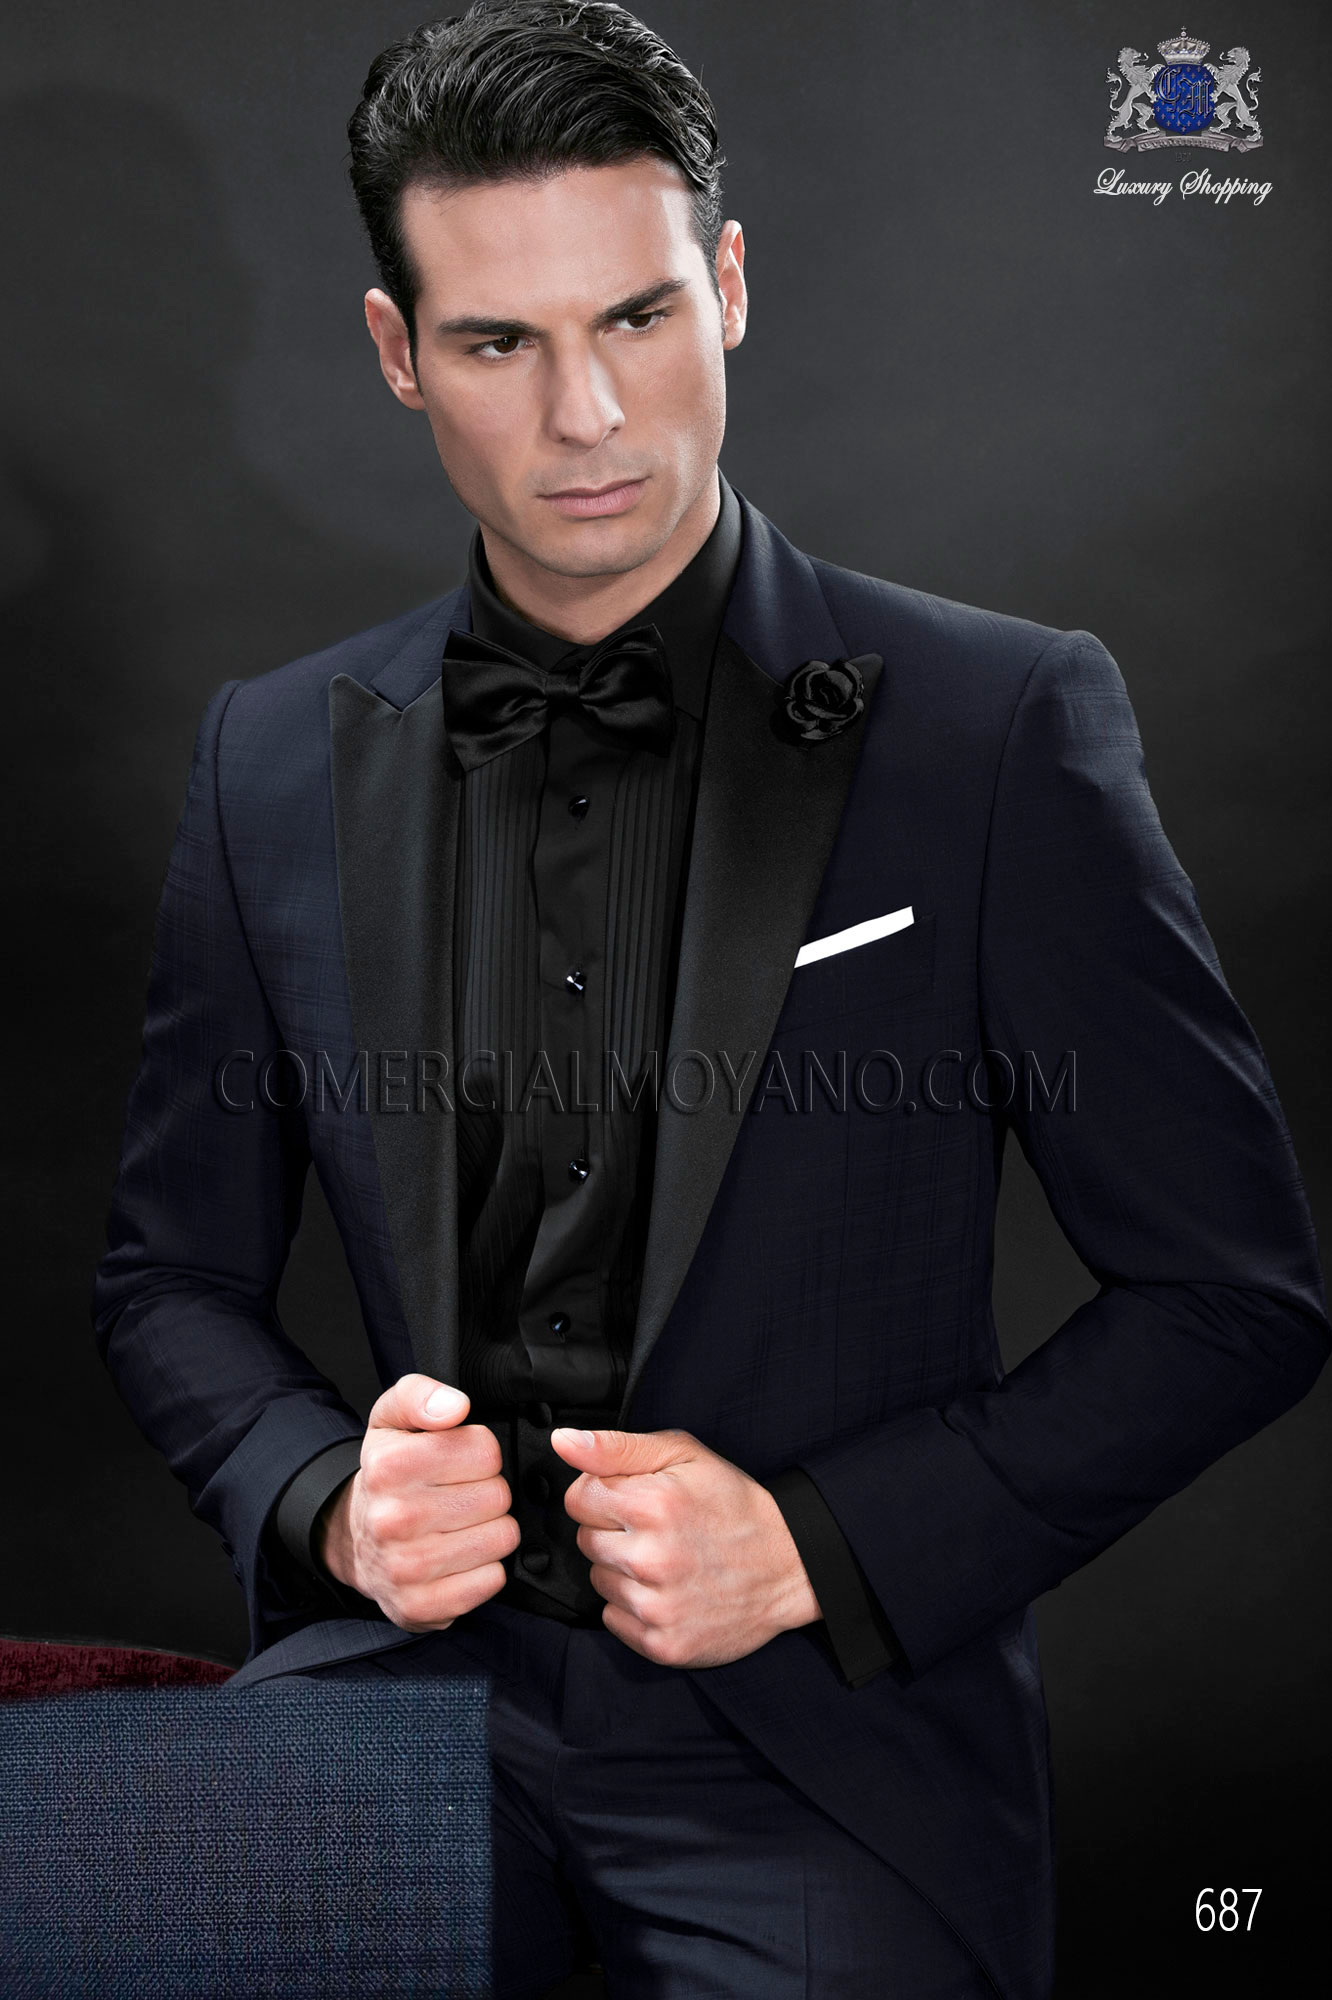 Italian Bespoke Tuxedo Black Wedding Suit Style 687 Ottavio Nuccio Gala